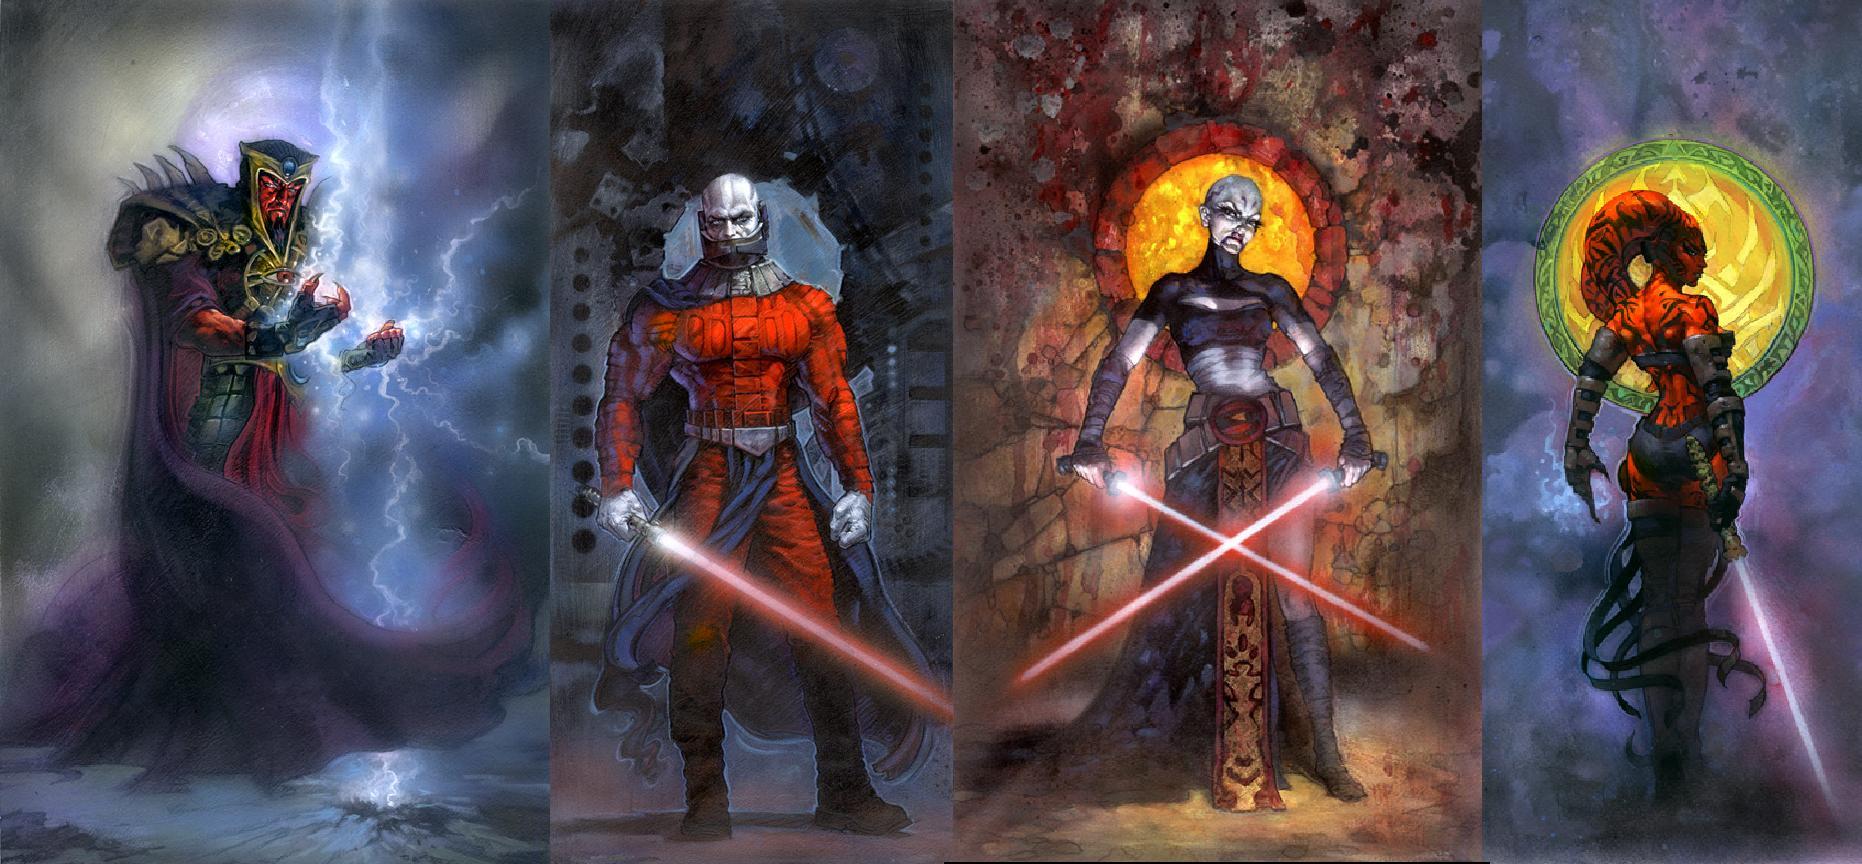 Star Wars Sith Lords Wallpaper By Masterbarkeep On Deviantart